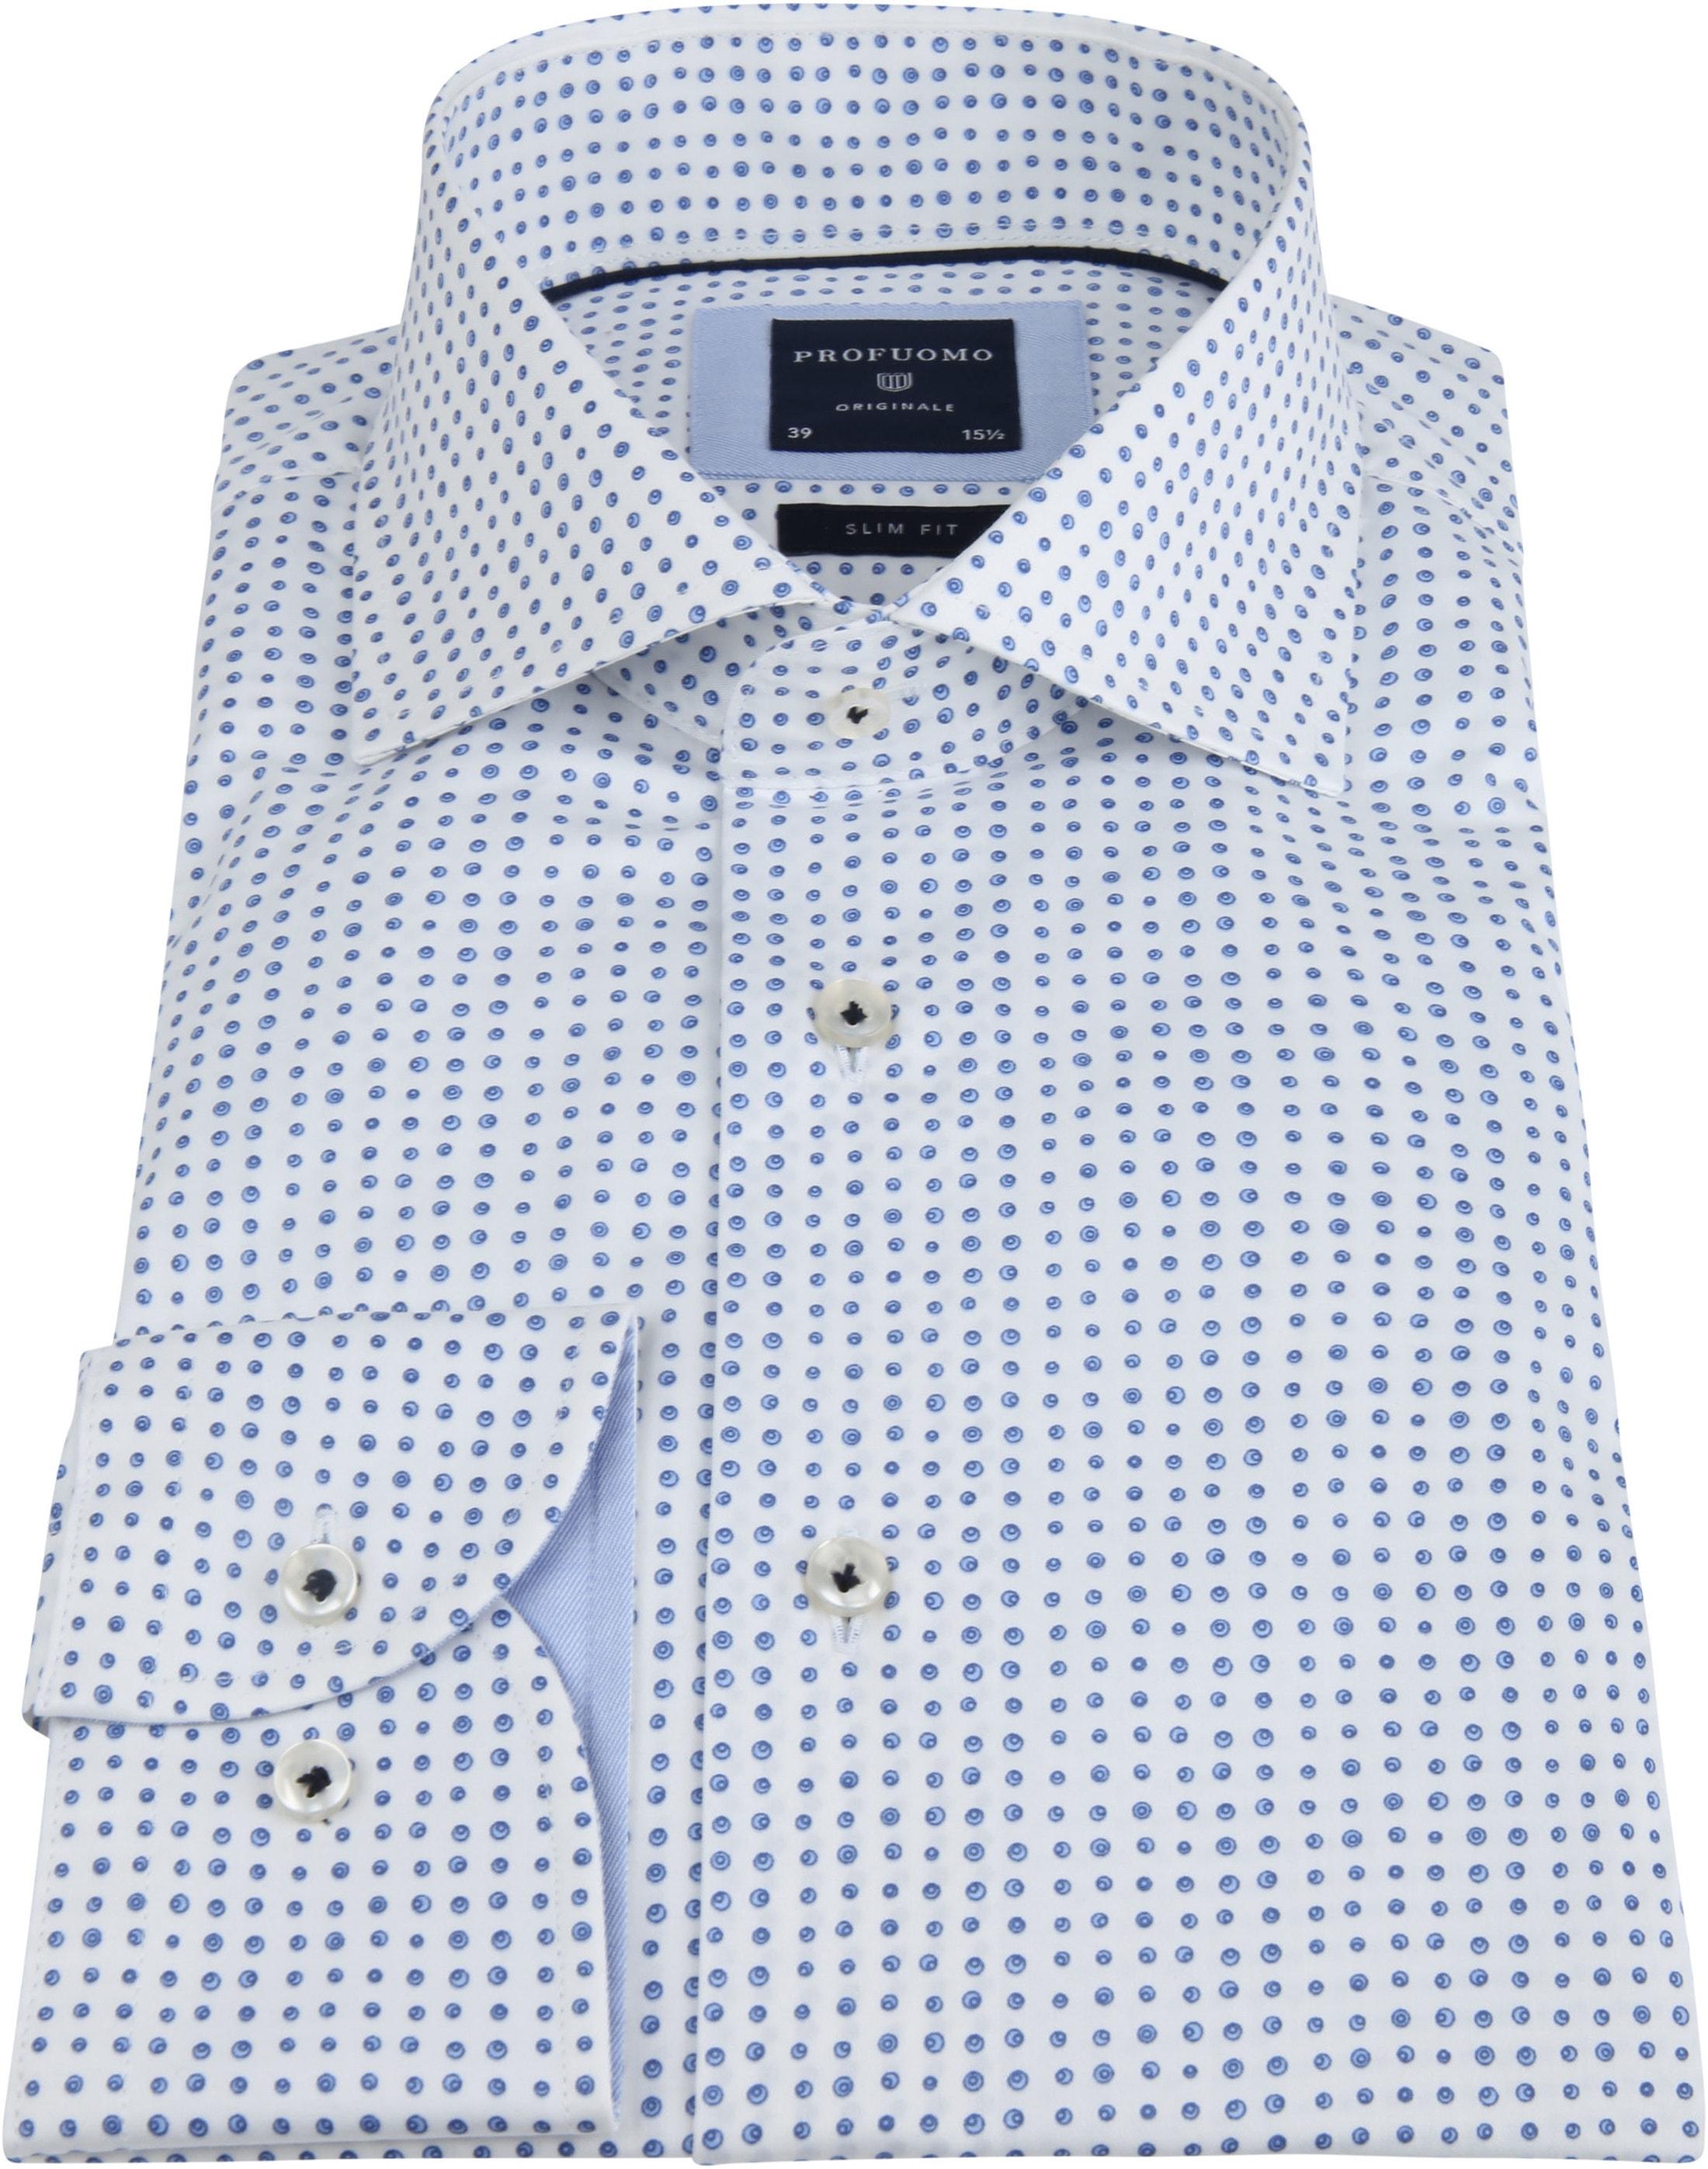 Profuomo Overhemd Stippen Blauw foto 2